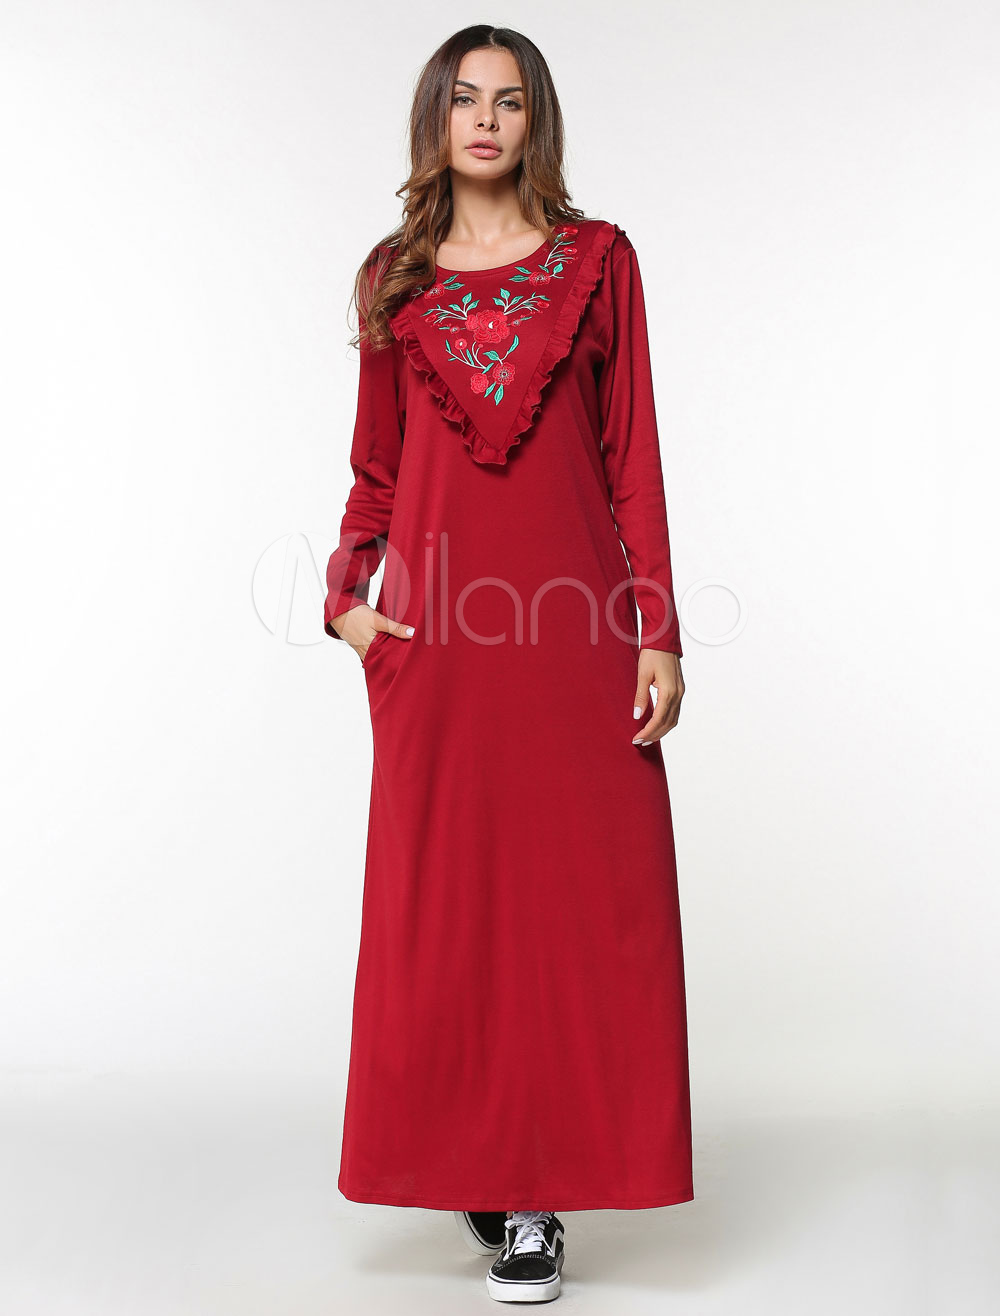 Oversized Kaftan Dress Women Red Floral Ruffles Long Sleeve Maxi Jalabiya Dress (Women\\'s Clothing Arabian Clothing) photo